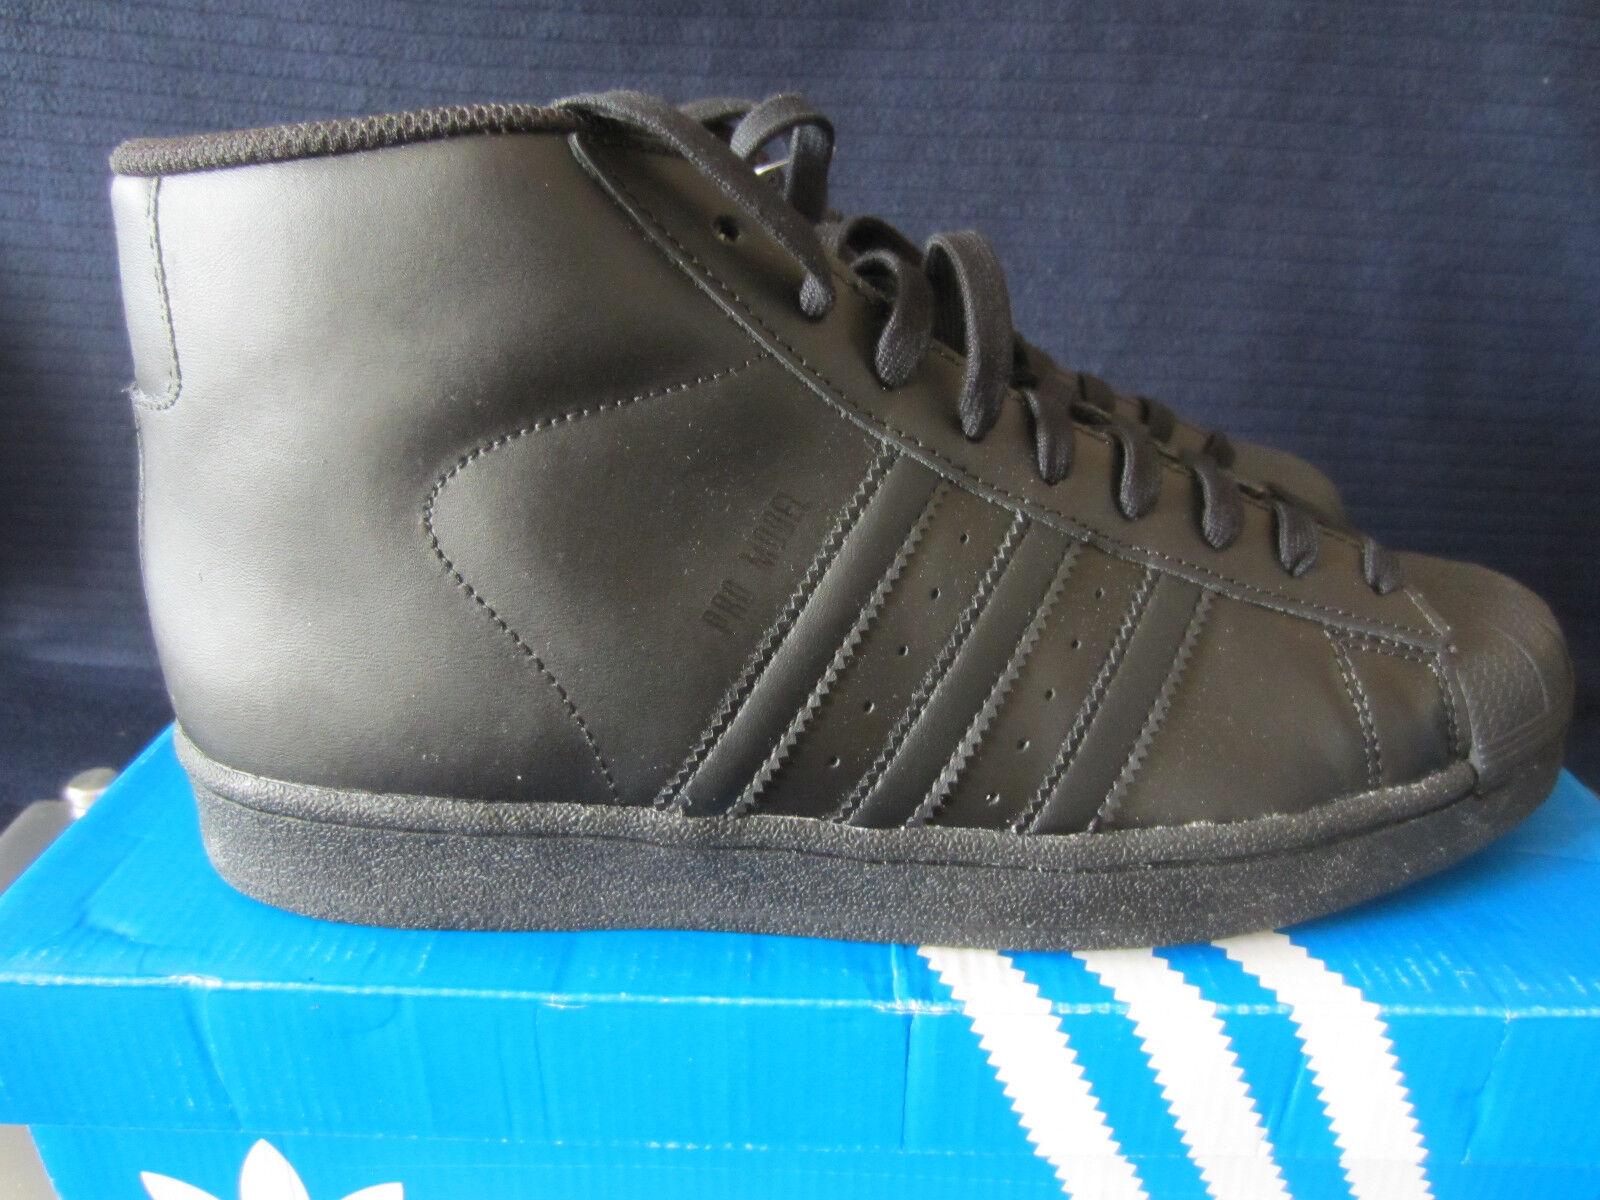 adidas Originals Pro Model S85957 Sneakers Gr.45 Schwarz Gr.45 Sneakers 1/3, 48. Neu und OVP! 7a7d9d